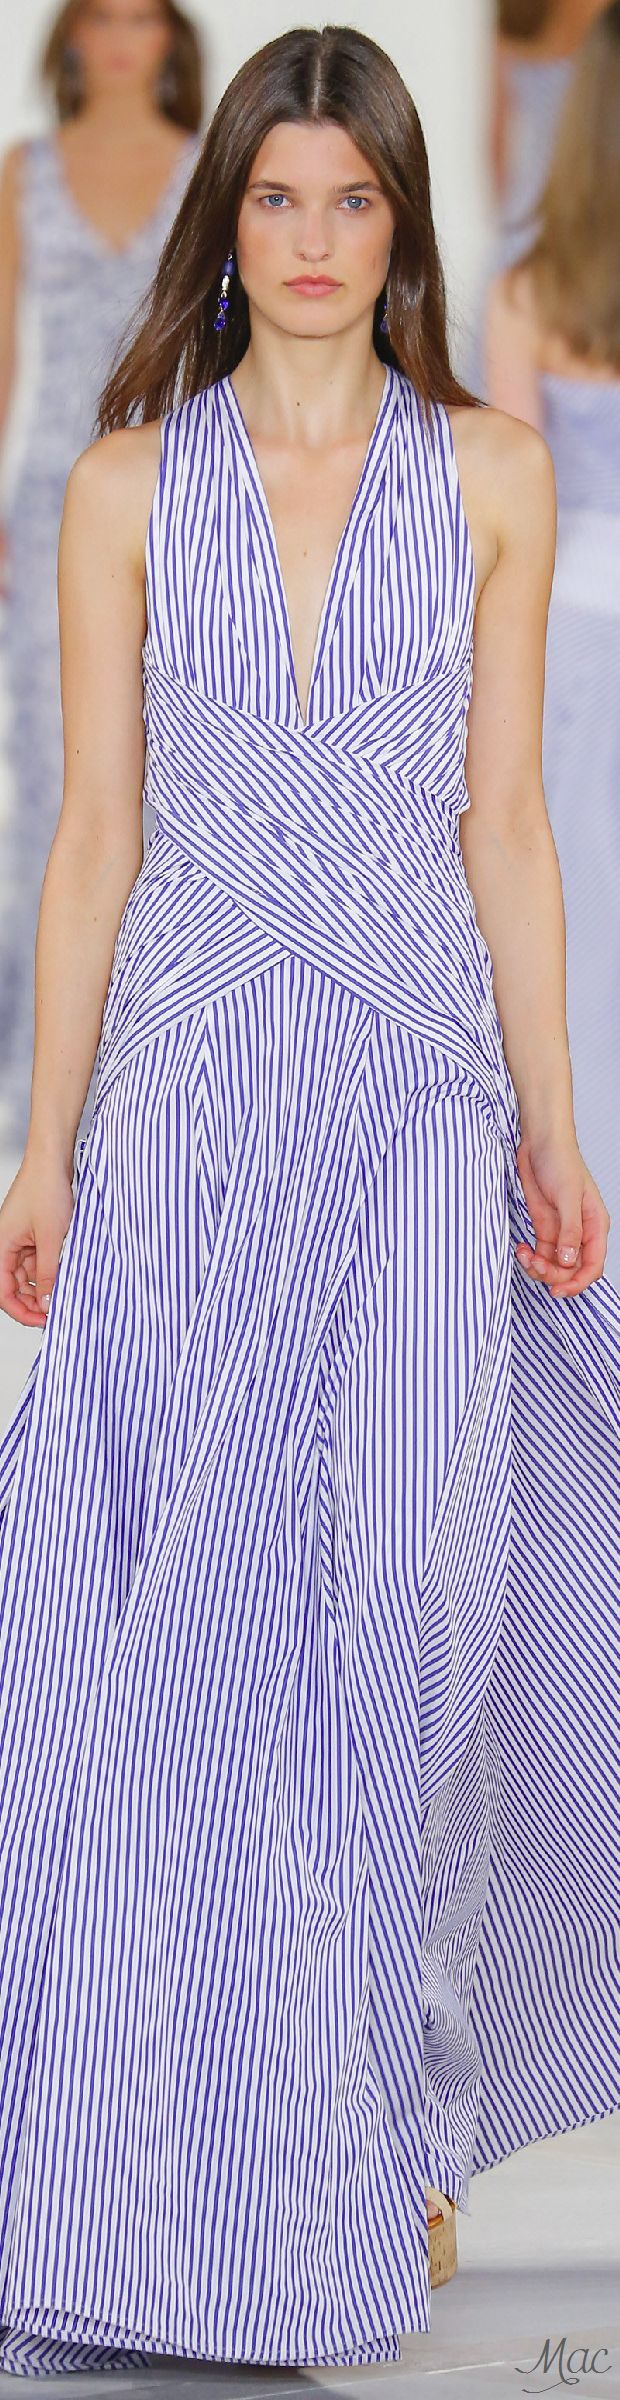 Spring 2016 Ready-to-Wear Ralph Lauren | Vestido coctel | Pinterest ...